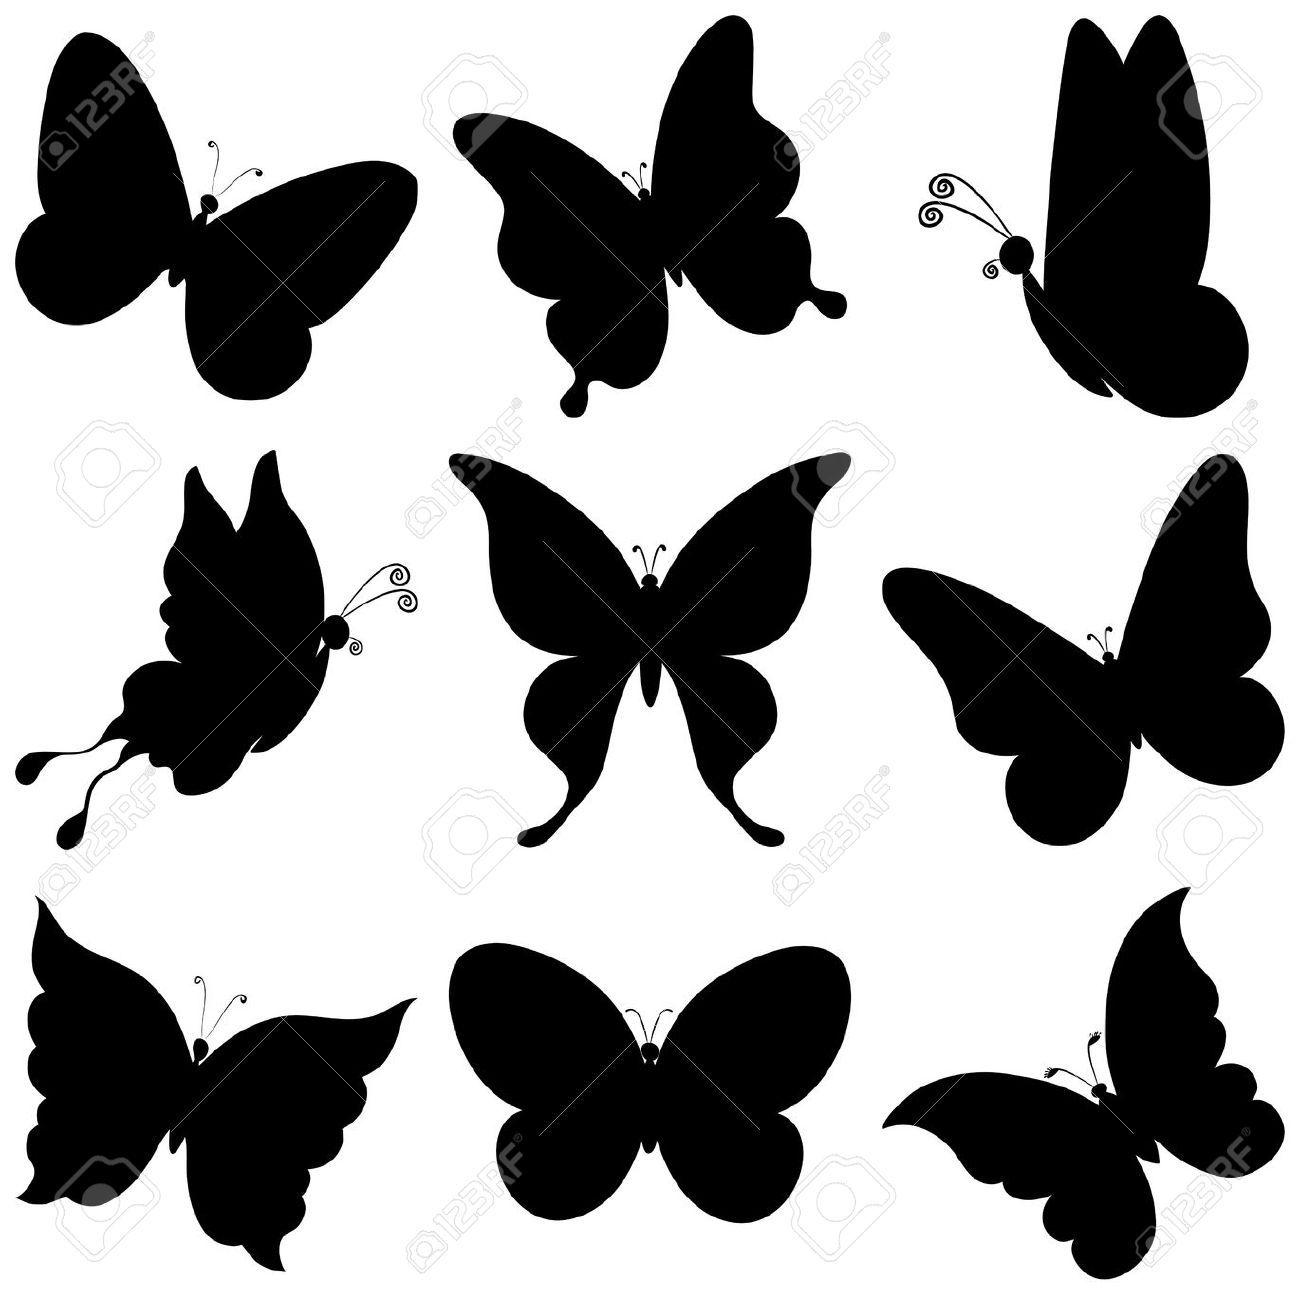 Silhouette papillon imprimer recherche google inspiration cr ation dessin papillon - Silhouette papillon imprimer ...